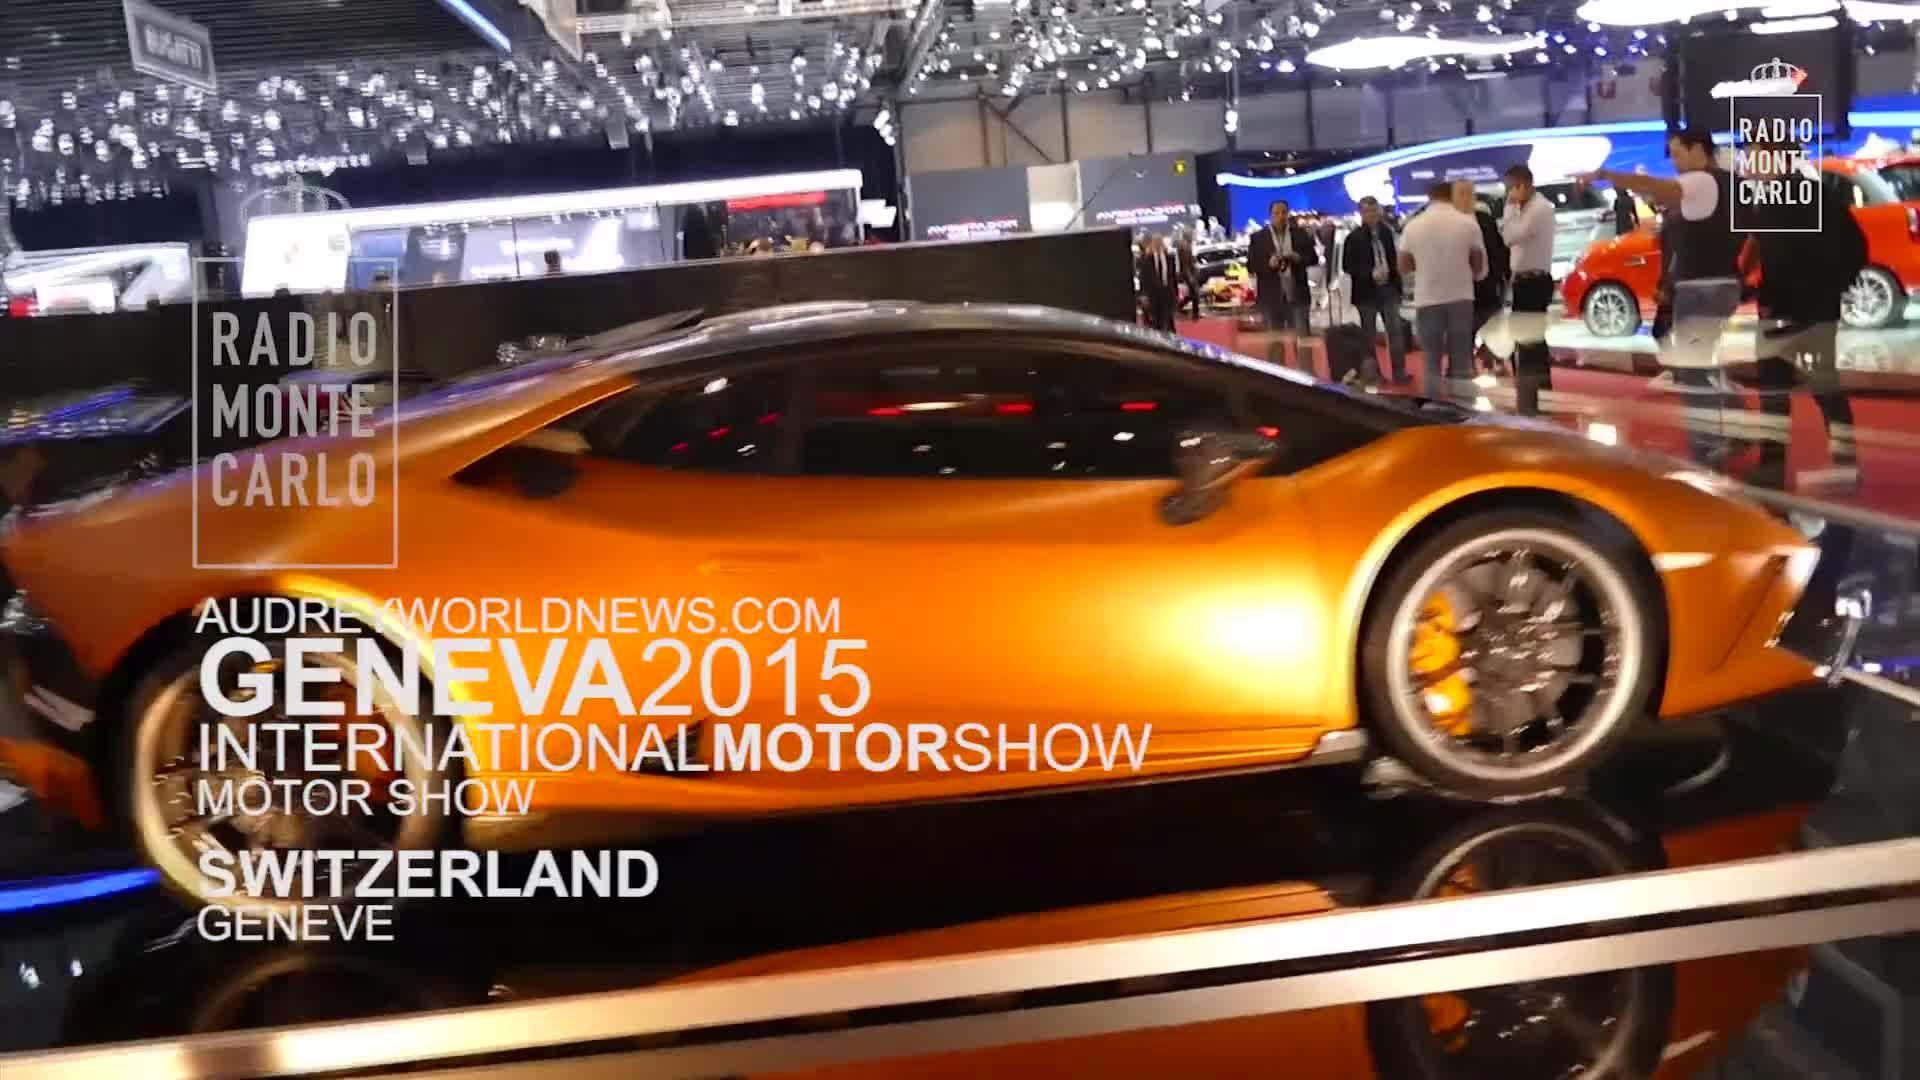 213518045-GINEVRAMOTORSHOW2015RMCmp4.jpg-- Marvelous Porsche 918 Spyder Hybrid Prezzo Cars Trend